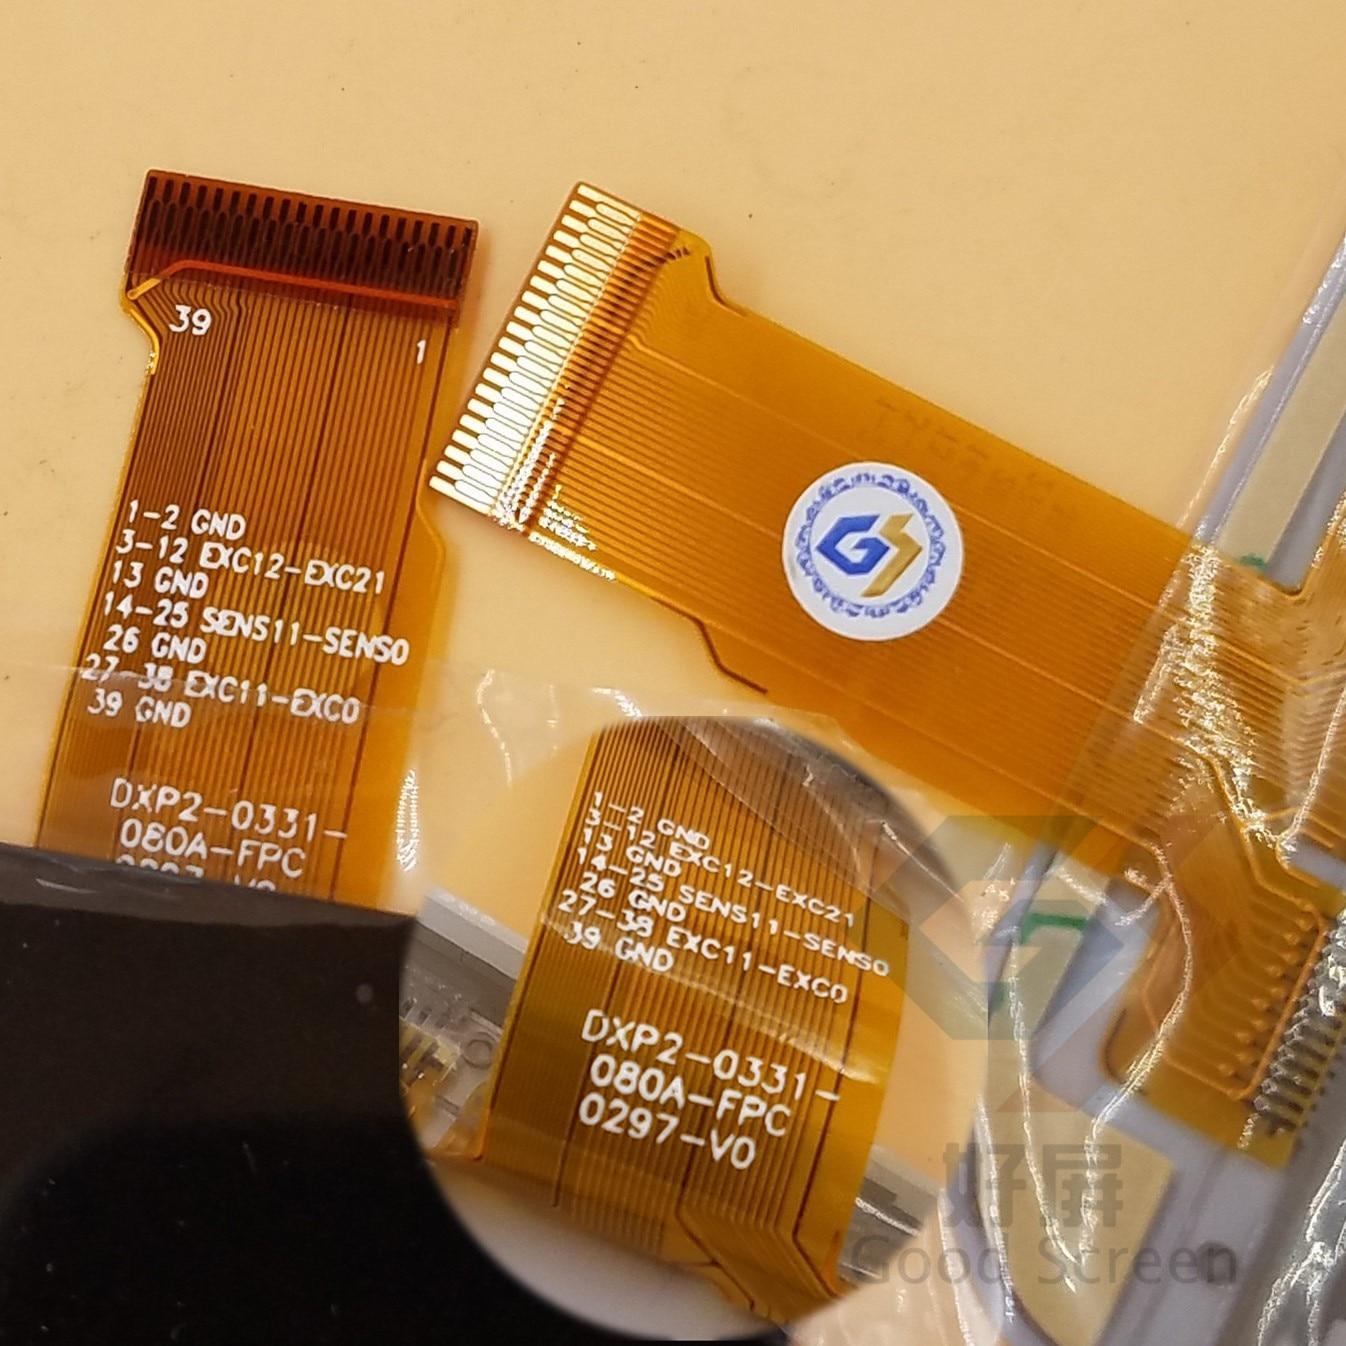 ORIGINAL NEW 8INCH DXP2-0331-080A-FPC DXP2-0316-080B TOUCH SCREEN DIGITIZER SENSOR PANEL REPAIRMENT Oysters T84ERI 3G